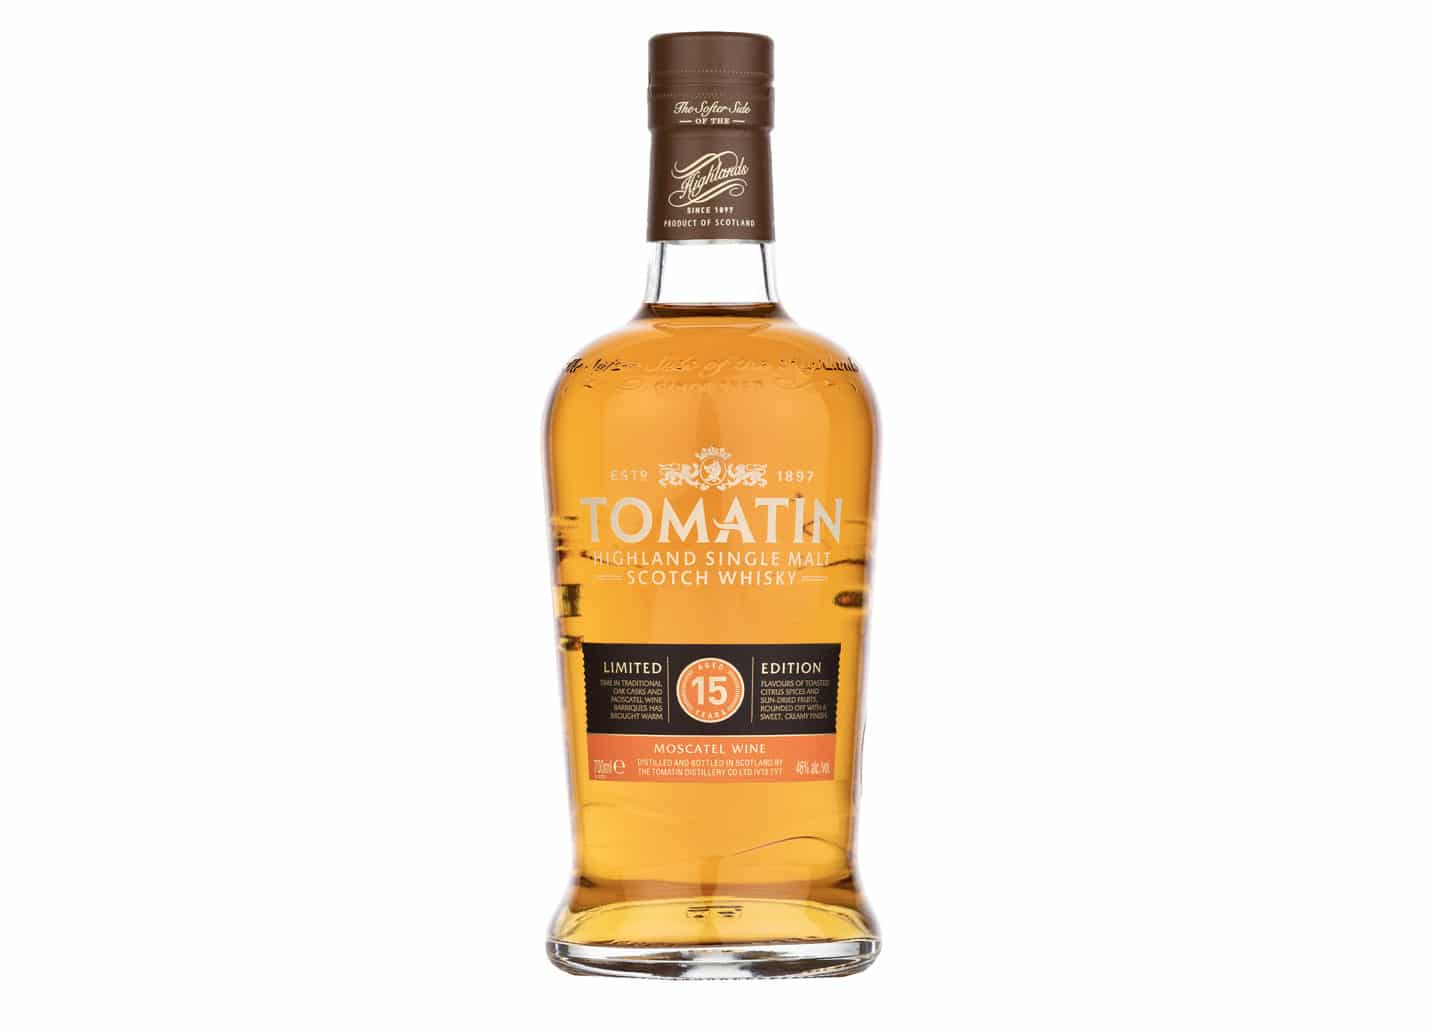 Tomatin 15 Moscatel - Todo Whisky